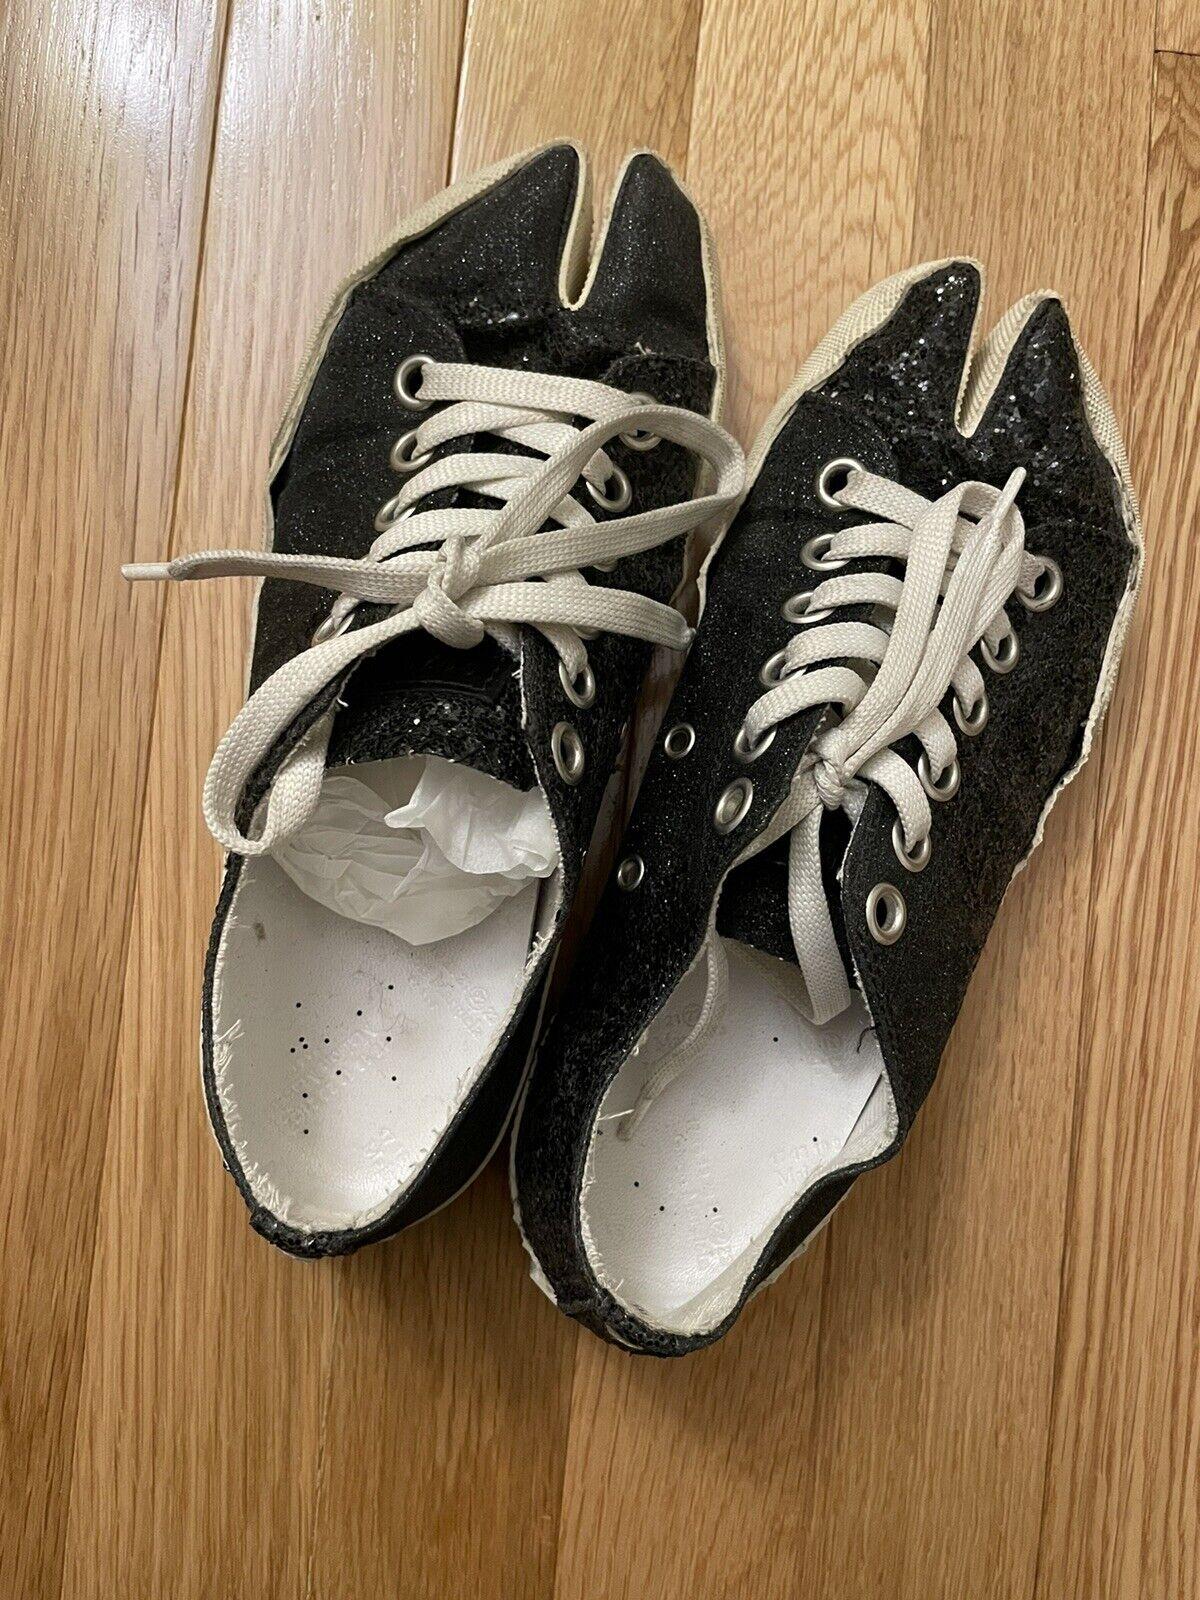 maison martin margiela women's shoes tabi 35 5 - image 2